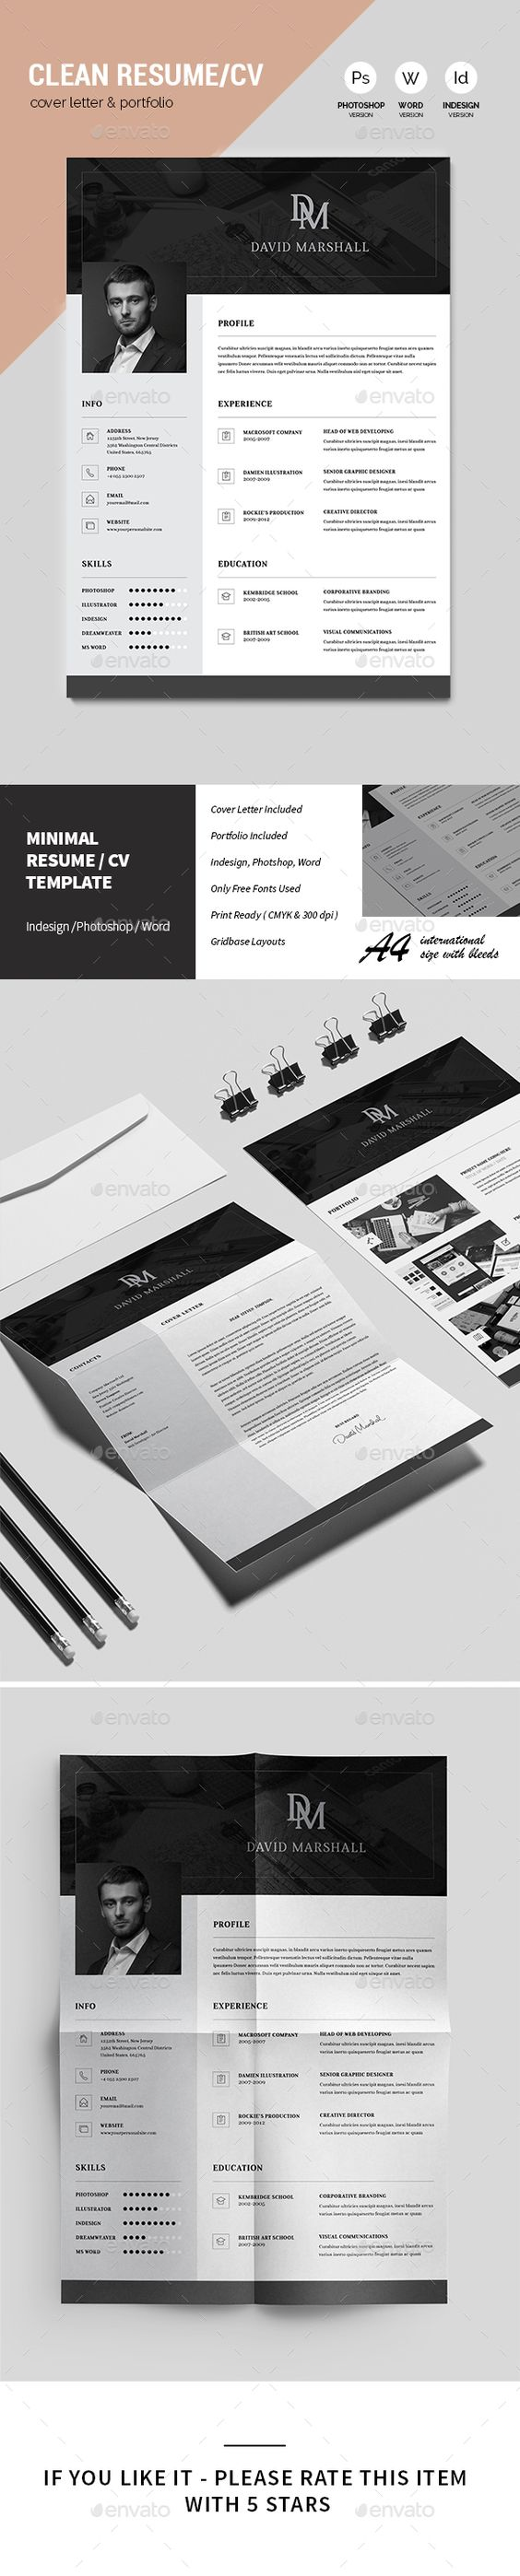 clean resume cv resume cv resume and cv template clean resume cv template indesign indd here graphicriver